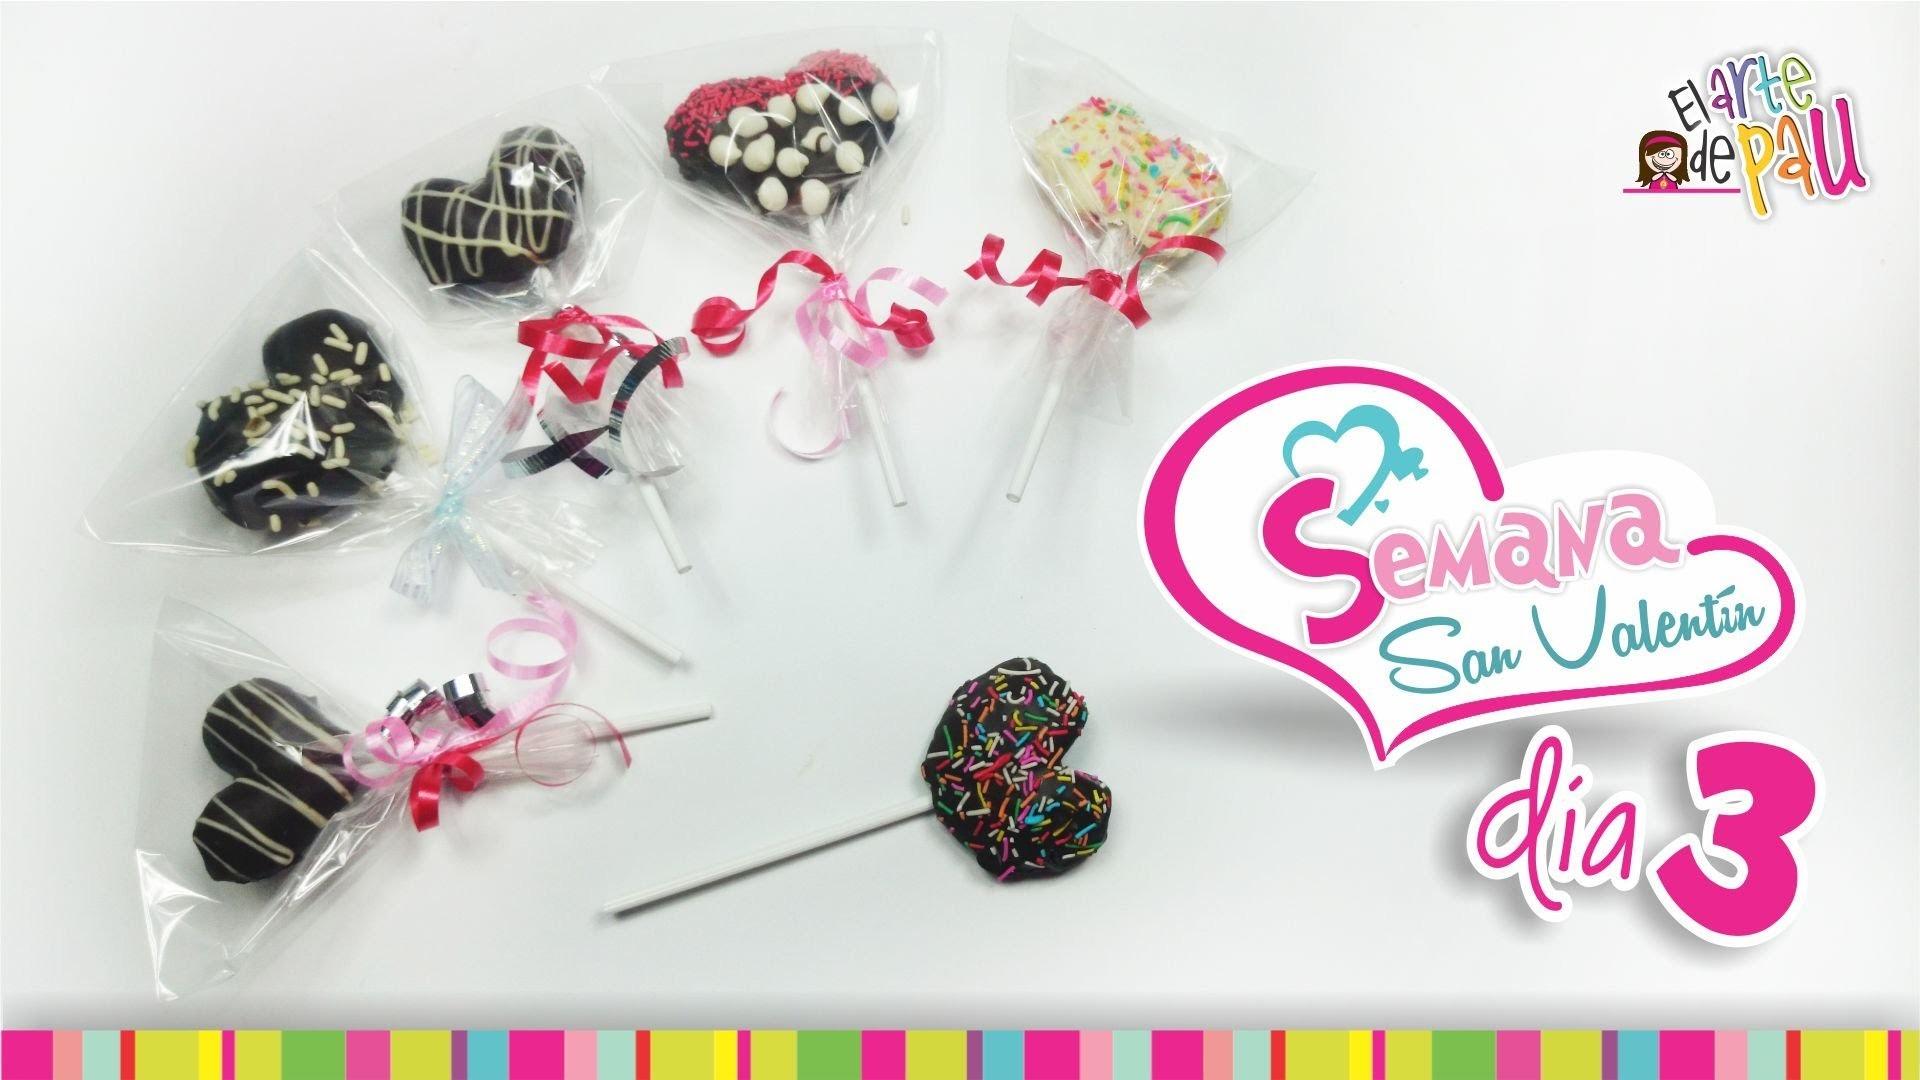 (Day 3) Strawberry Lollipop Valentine's Day. (Día 3) Paleta de fresa San Valentín